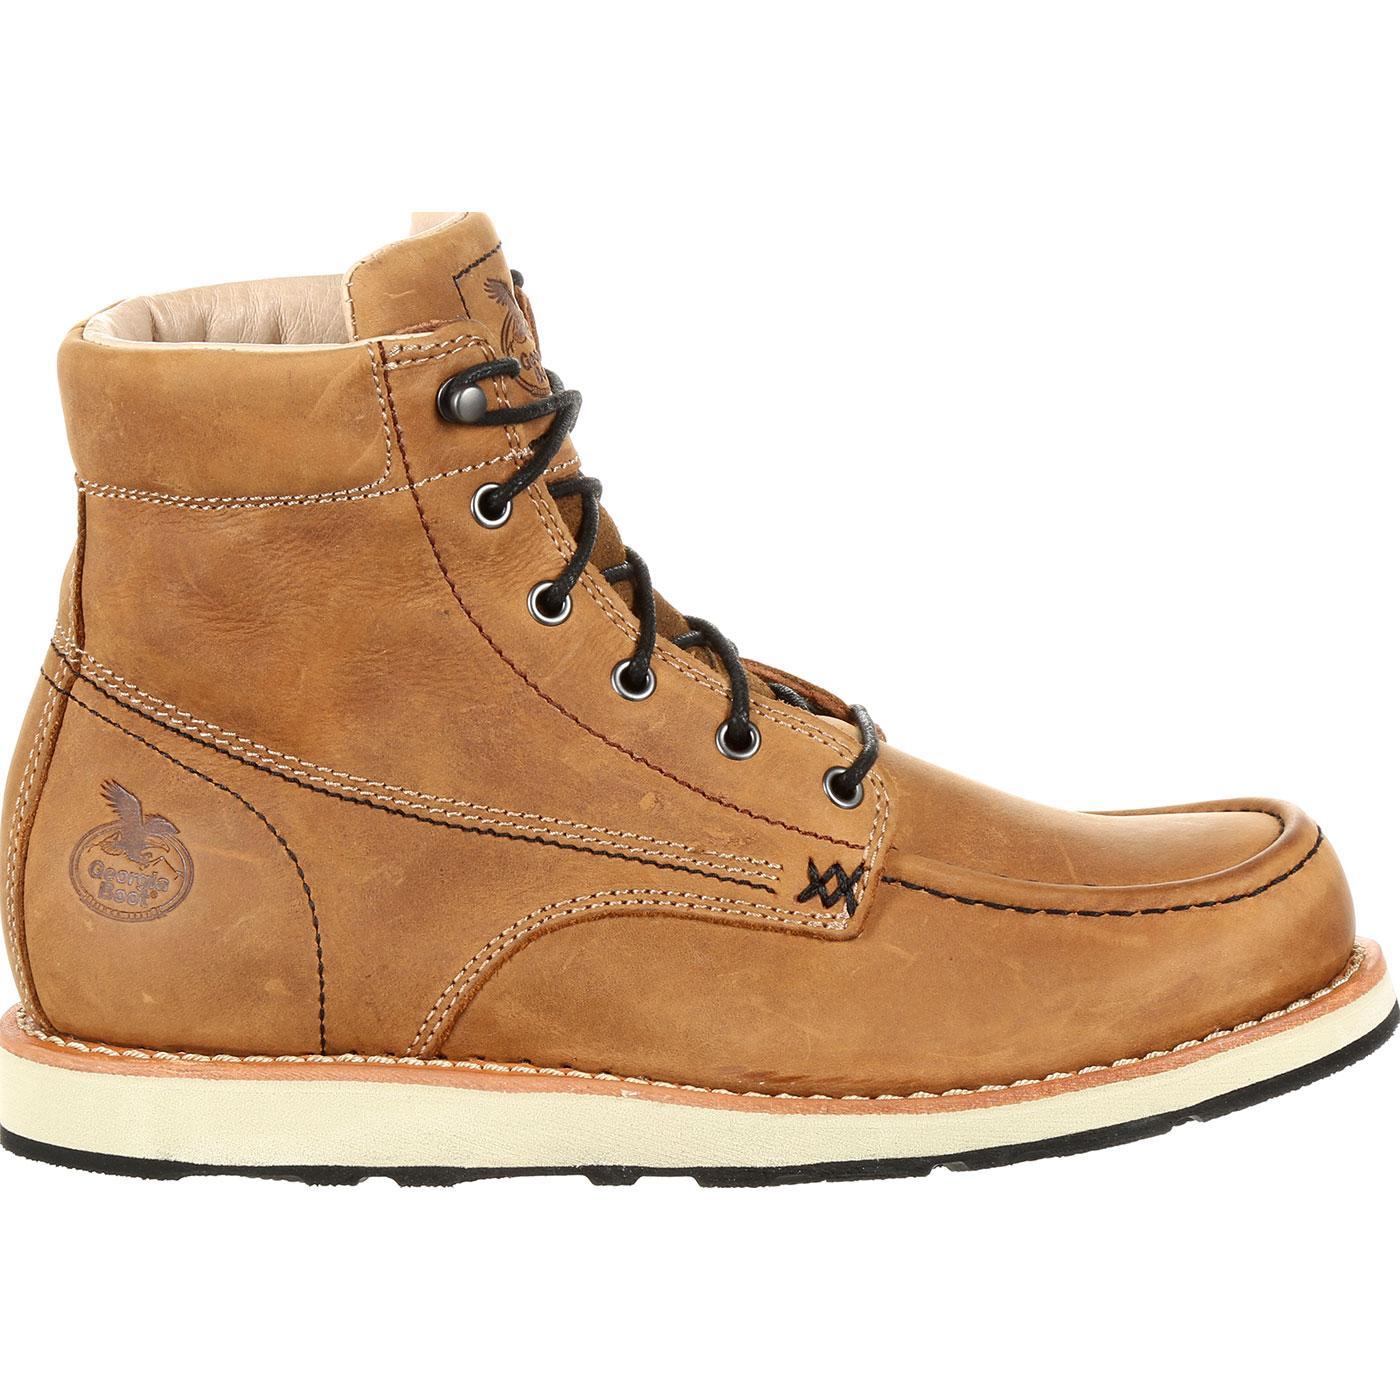 32143e95261 Georgia Boot Small Batch Wedge Brown Boot